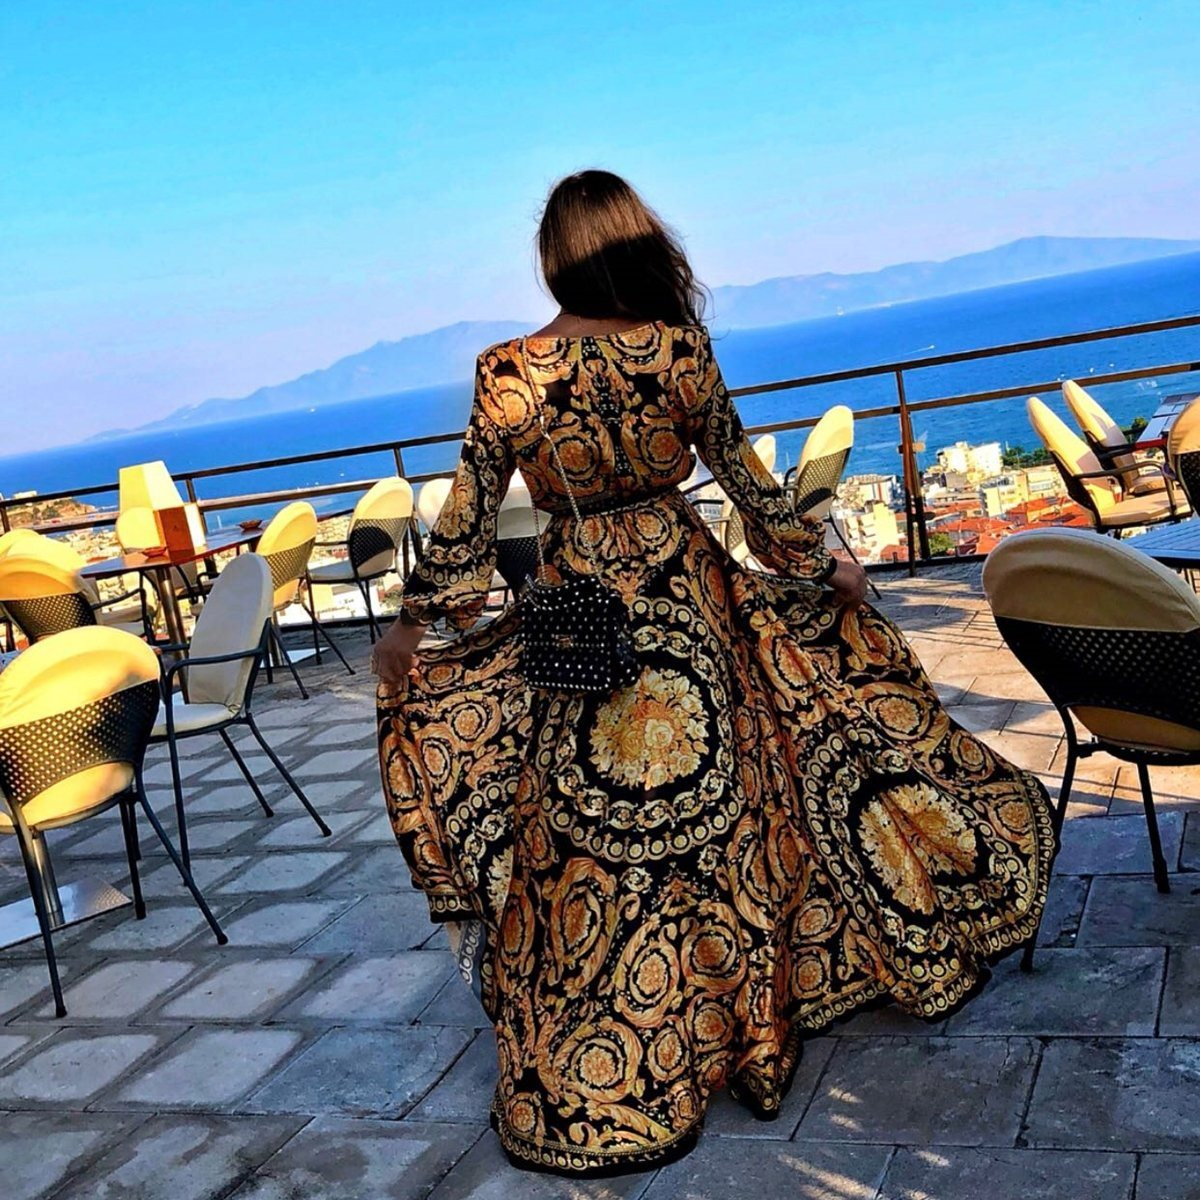 Sexy Women Floral Print Spring Boho Dresses 2019 New Long Sleeve V Neck Long Dress Party Beach Holiday Club Dresses Sundress